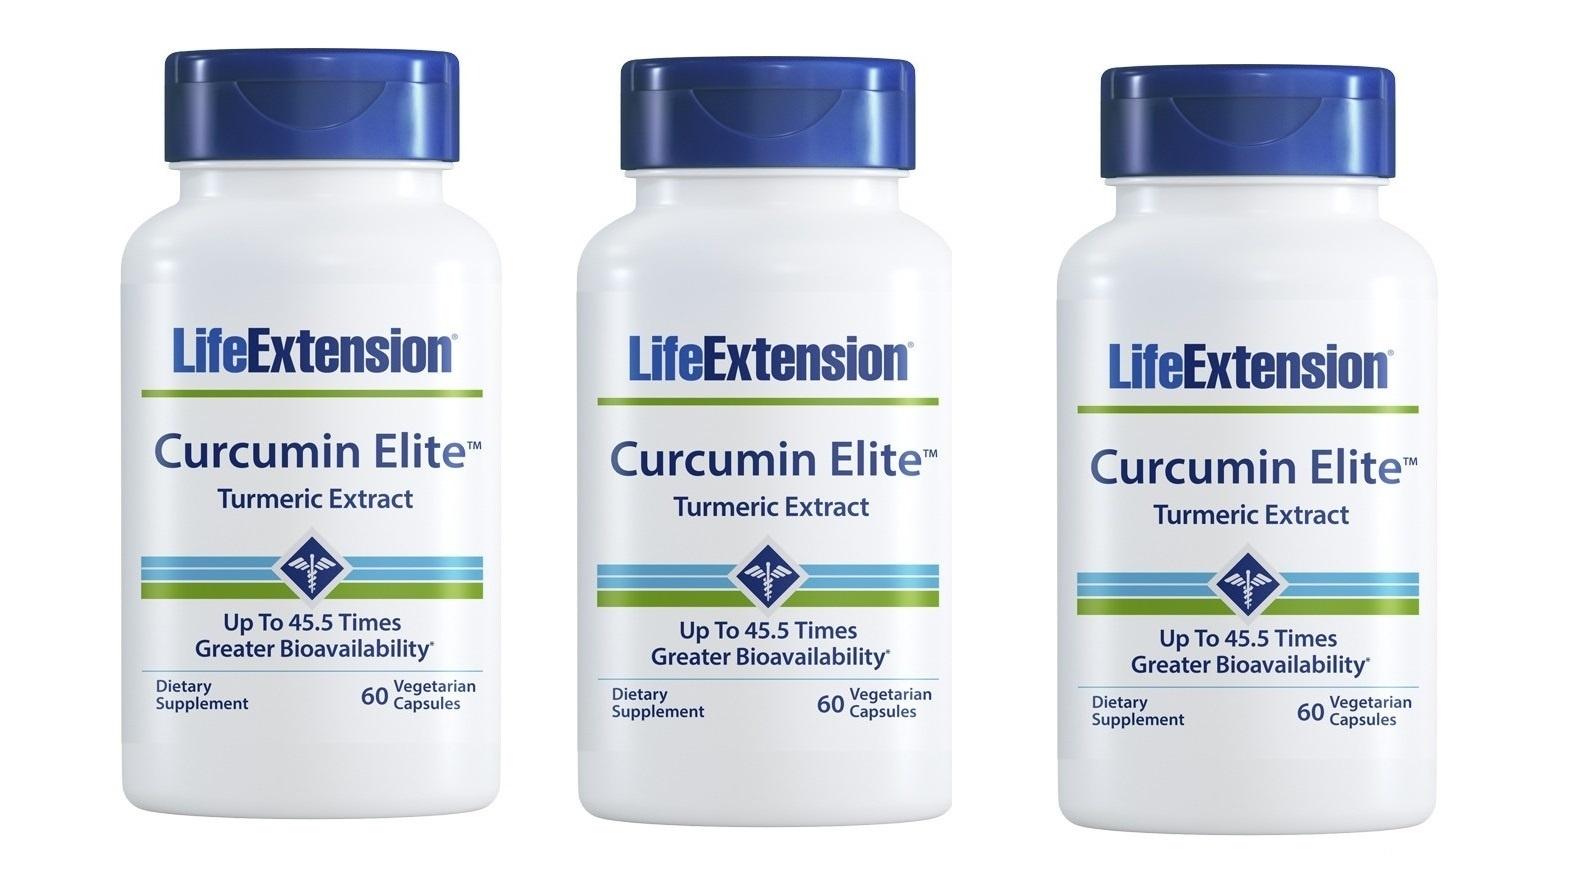 Life Extension Curcumin Elite™ Turmeric Extract, 60 Vegetarian Capsules, 3-pack